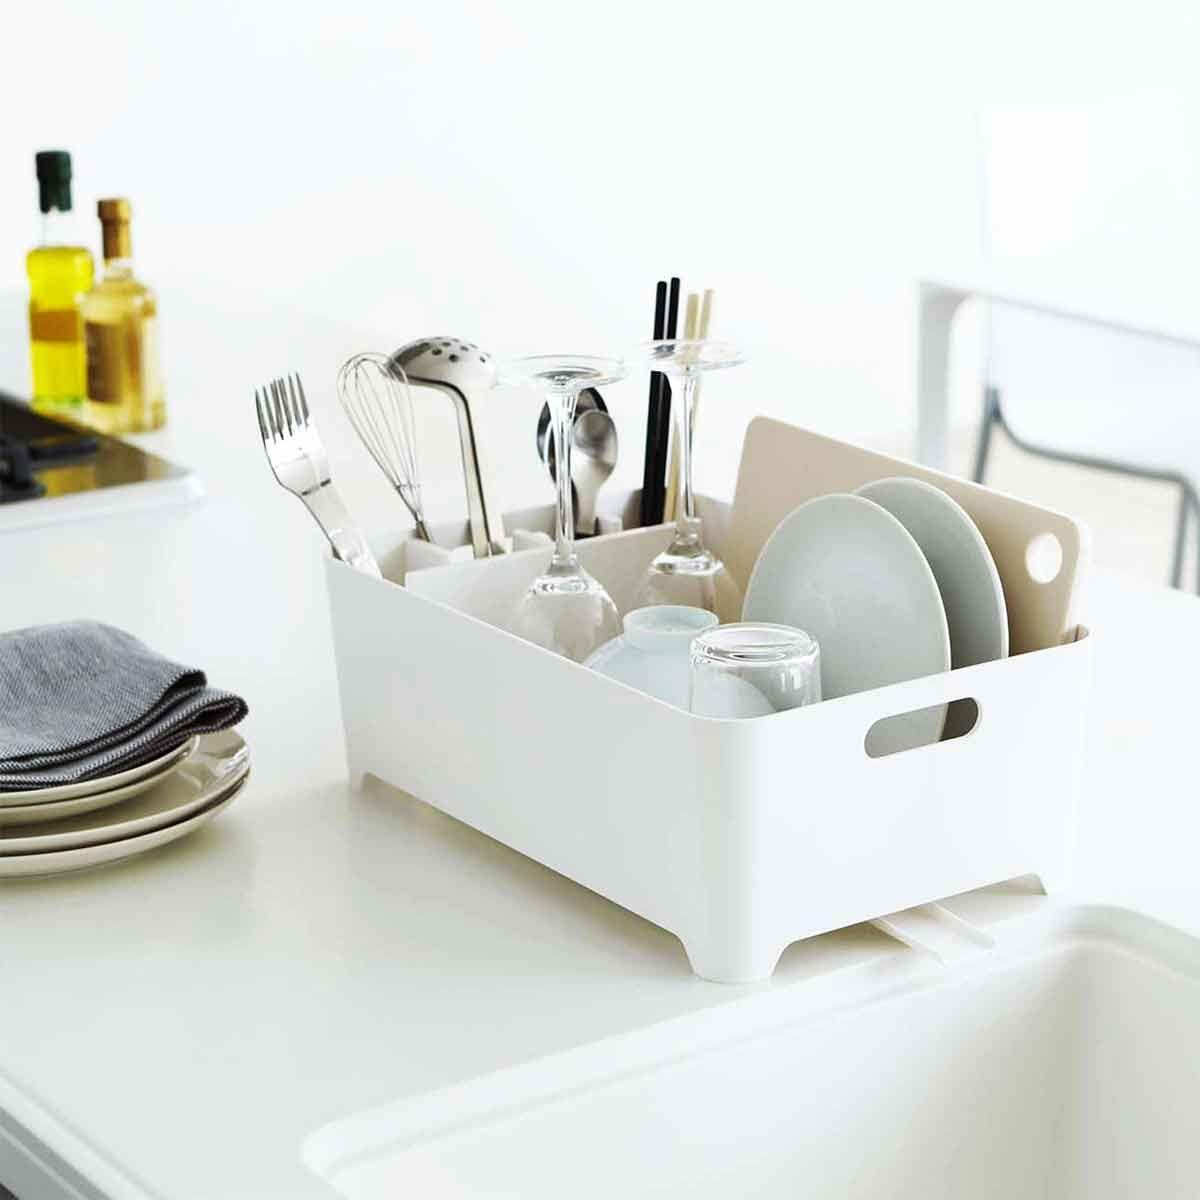 egouttoir design blanc rangement vaisselle cuisine decorating ideas pinterest. Black Bedroom Furniture Sets. Home Design Ideas